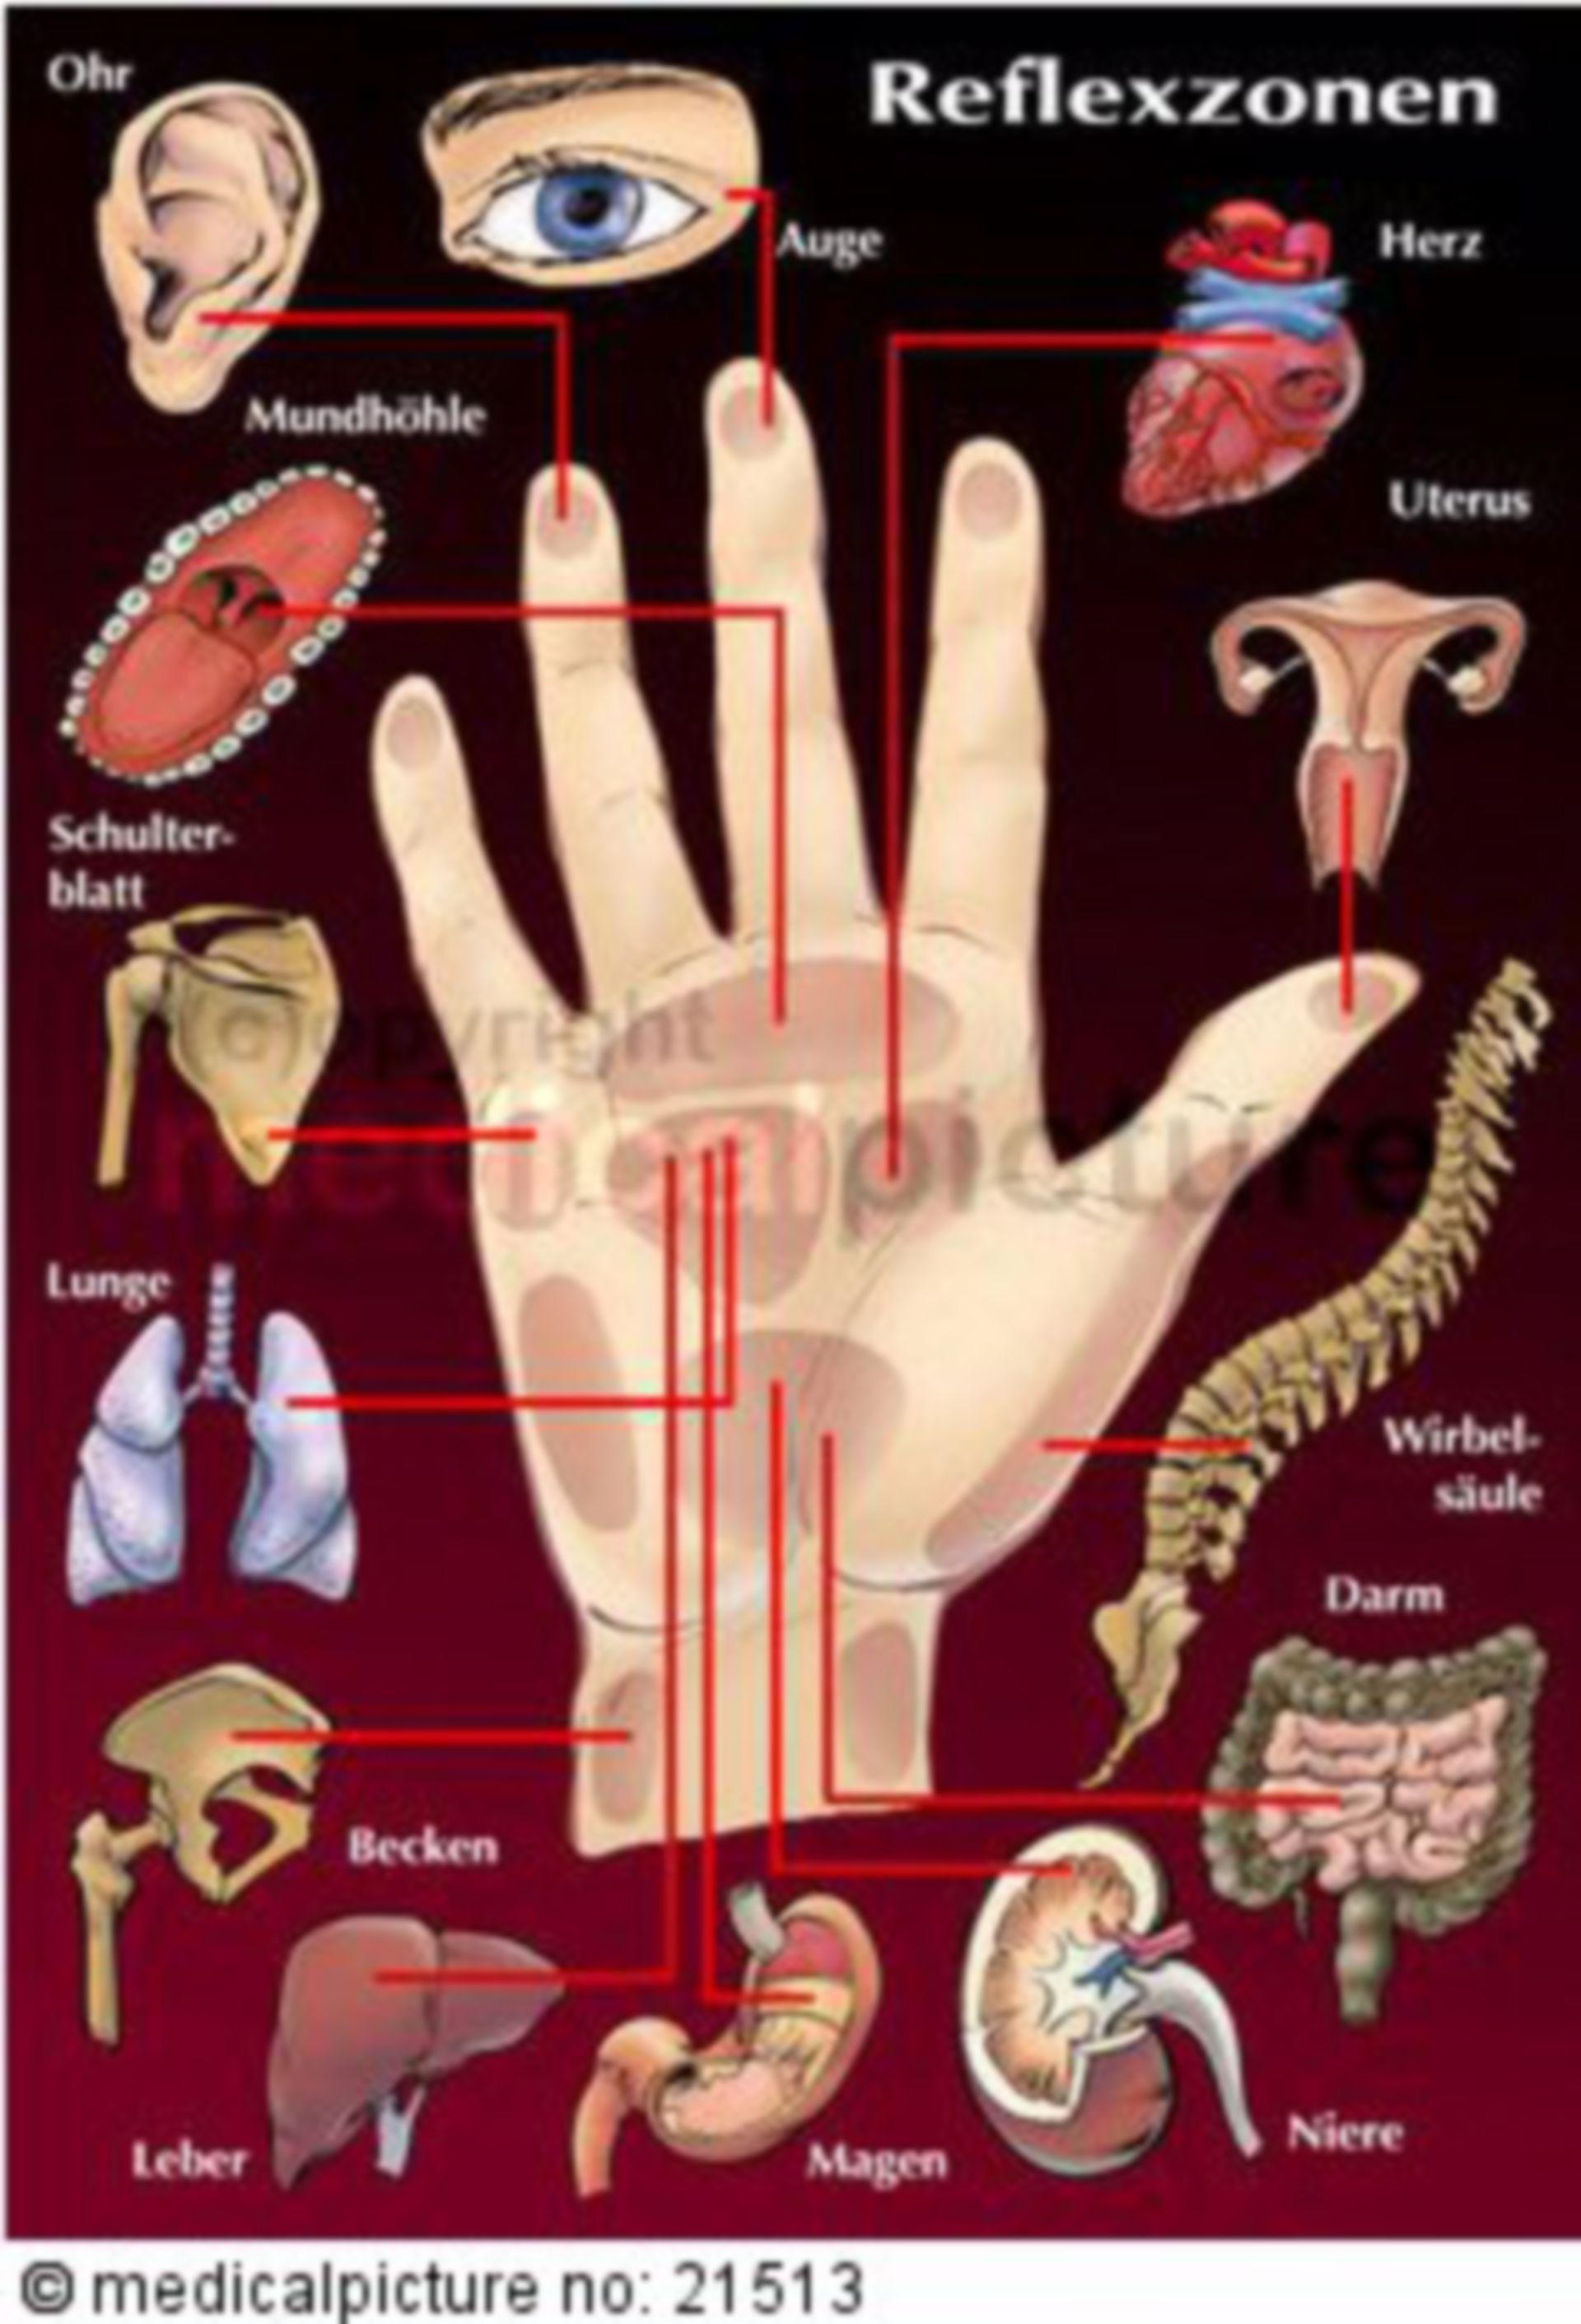 Hand reflexology zones